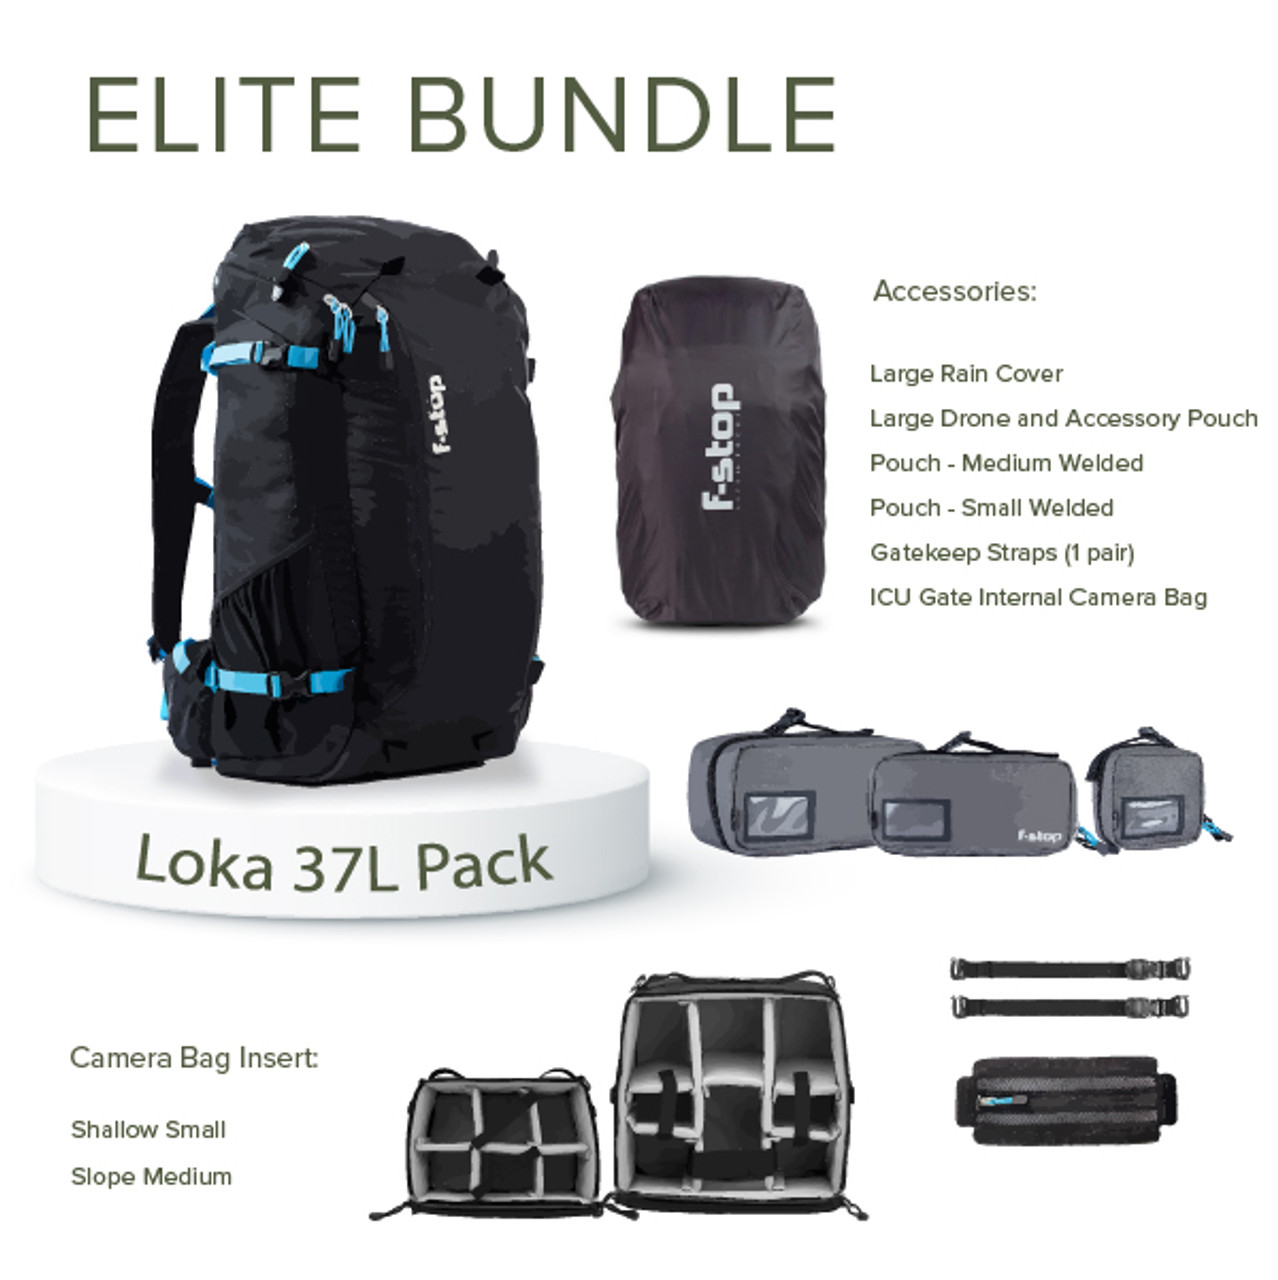 LOKA UL - 37 Liter Travel and Adventure Camera Backpack